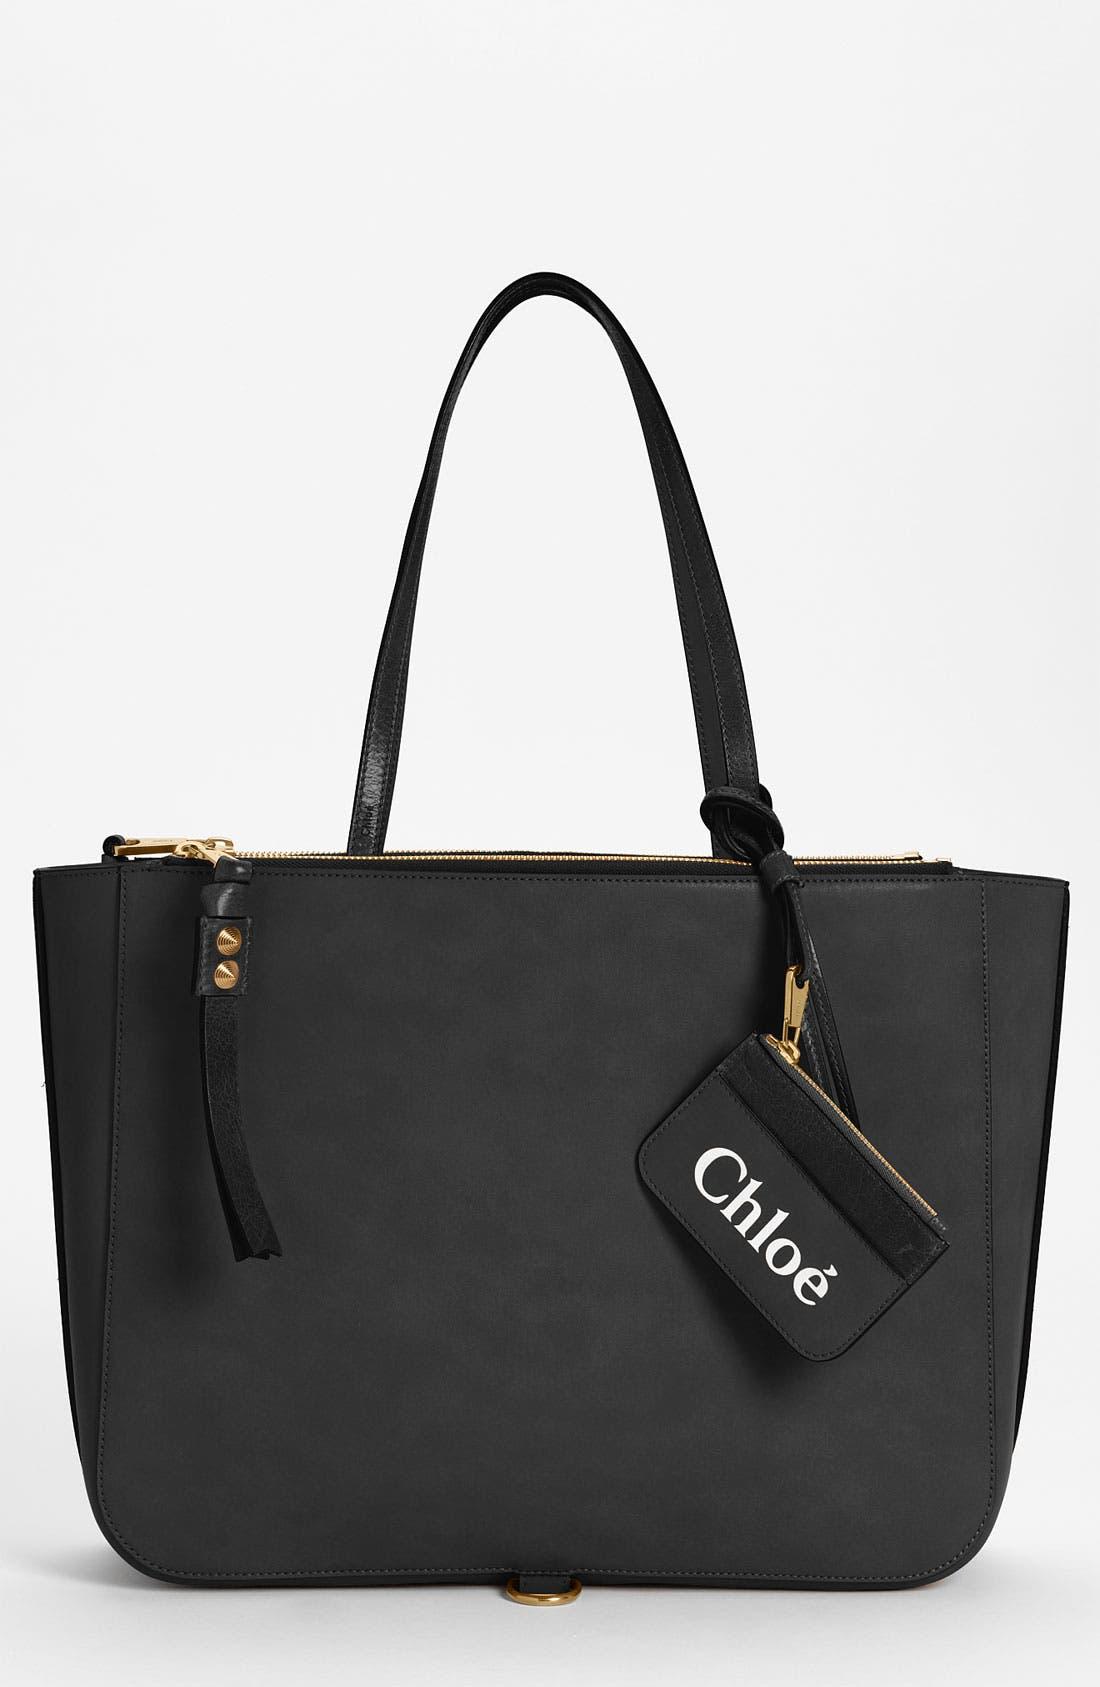 Main Image - Chloé 'Sam - Medium' Leather Tote